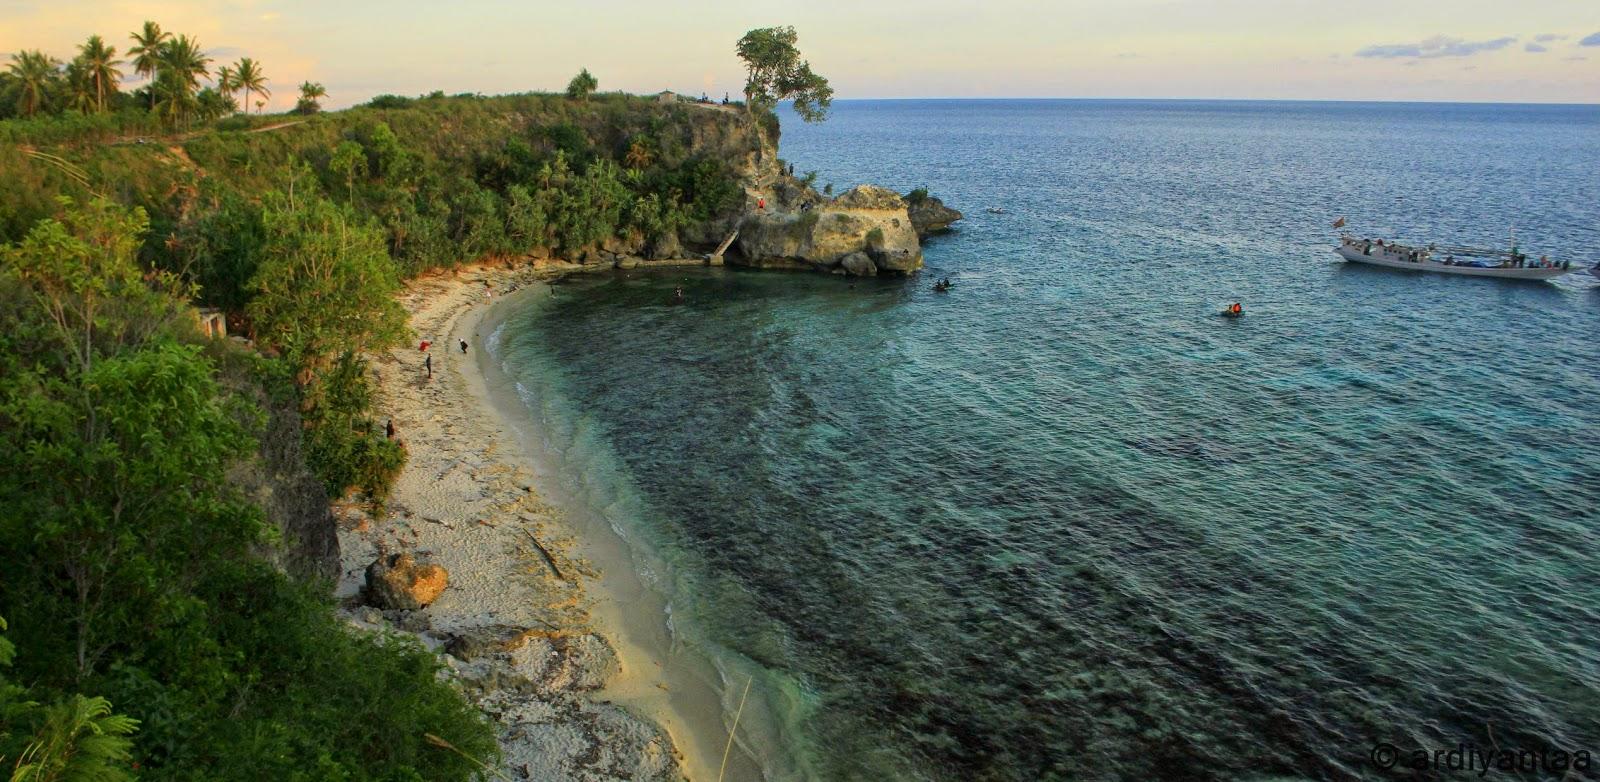 Catatan Pinky Peranan Pariwisata Mendorong Pertumbuhan Ekonomi Pantai Palippis Kab